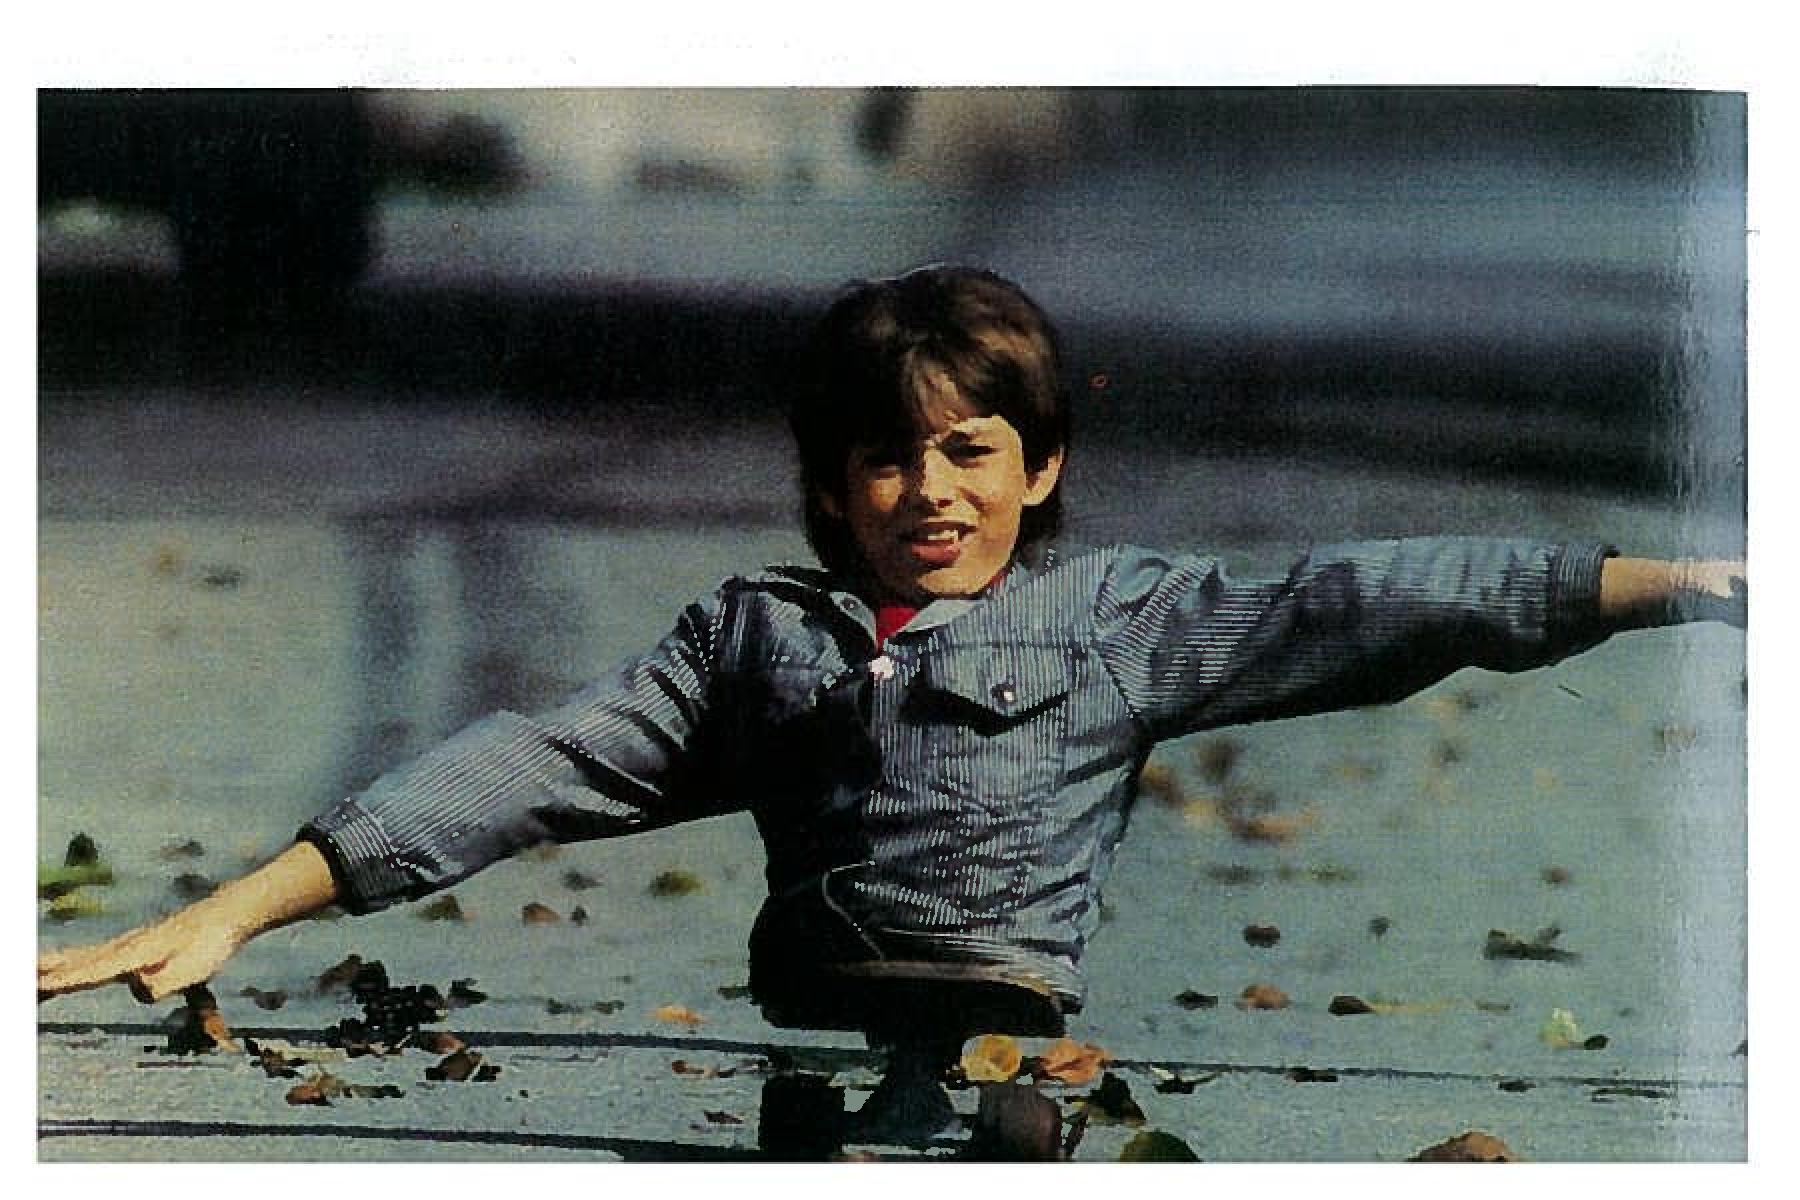 Kenny skateboard-page-001.jpg